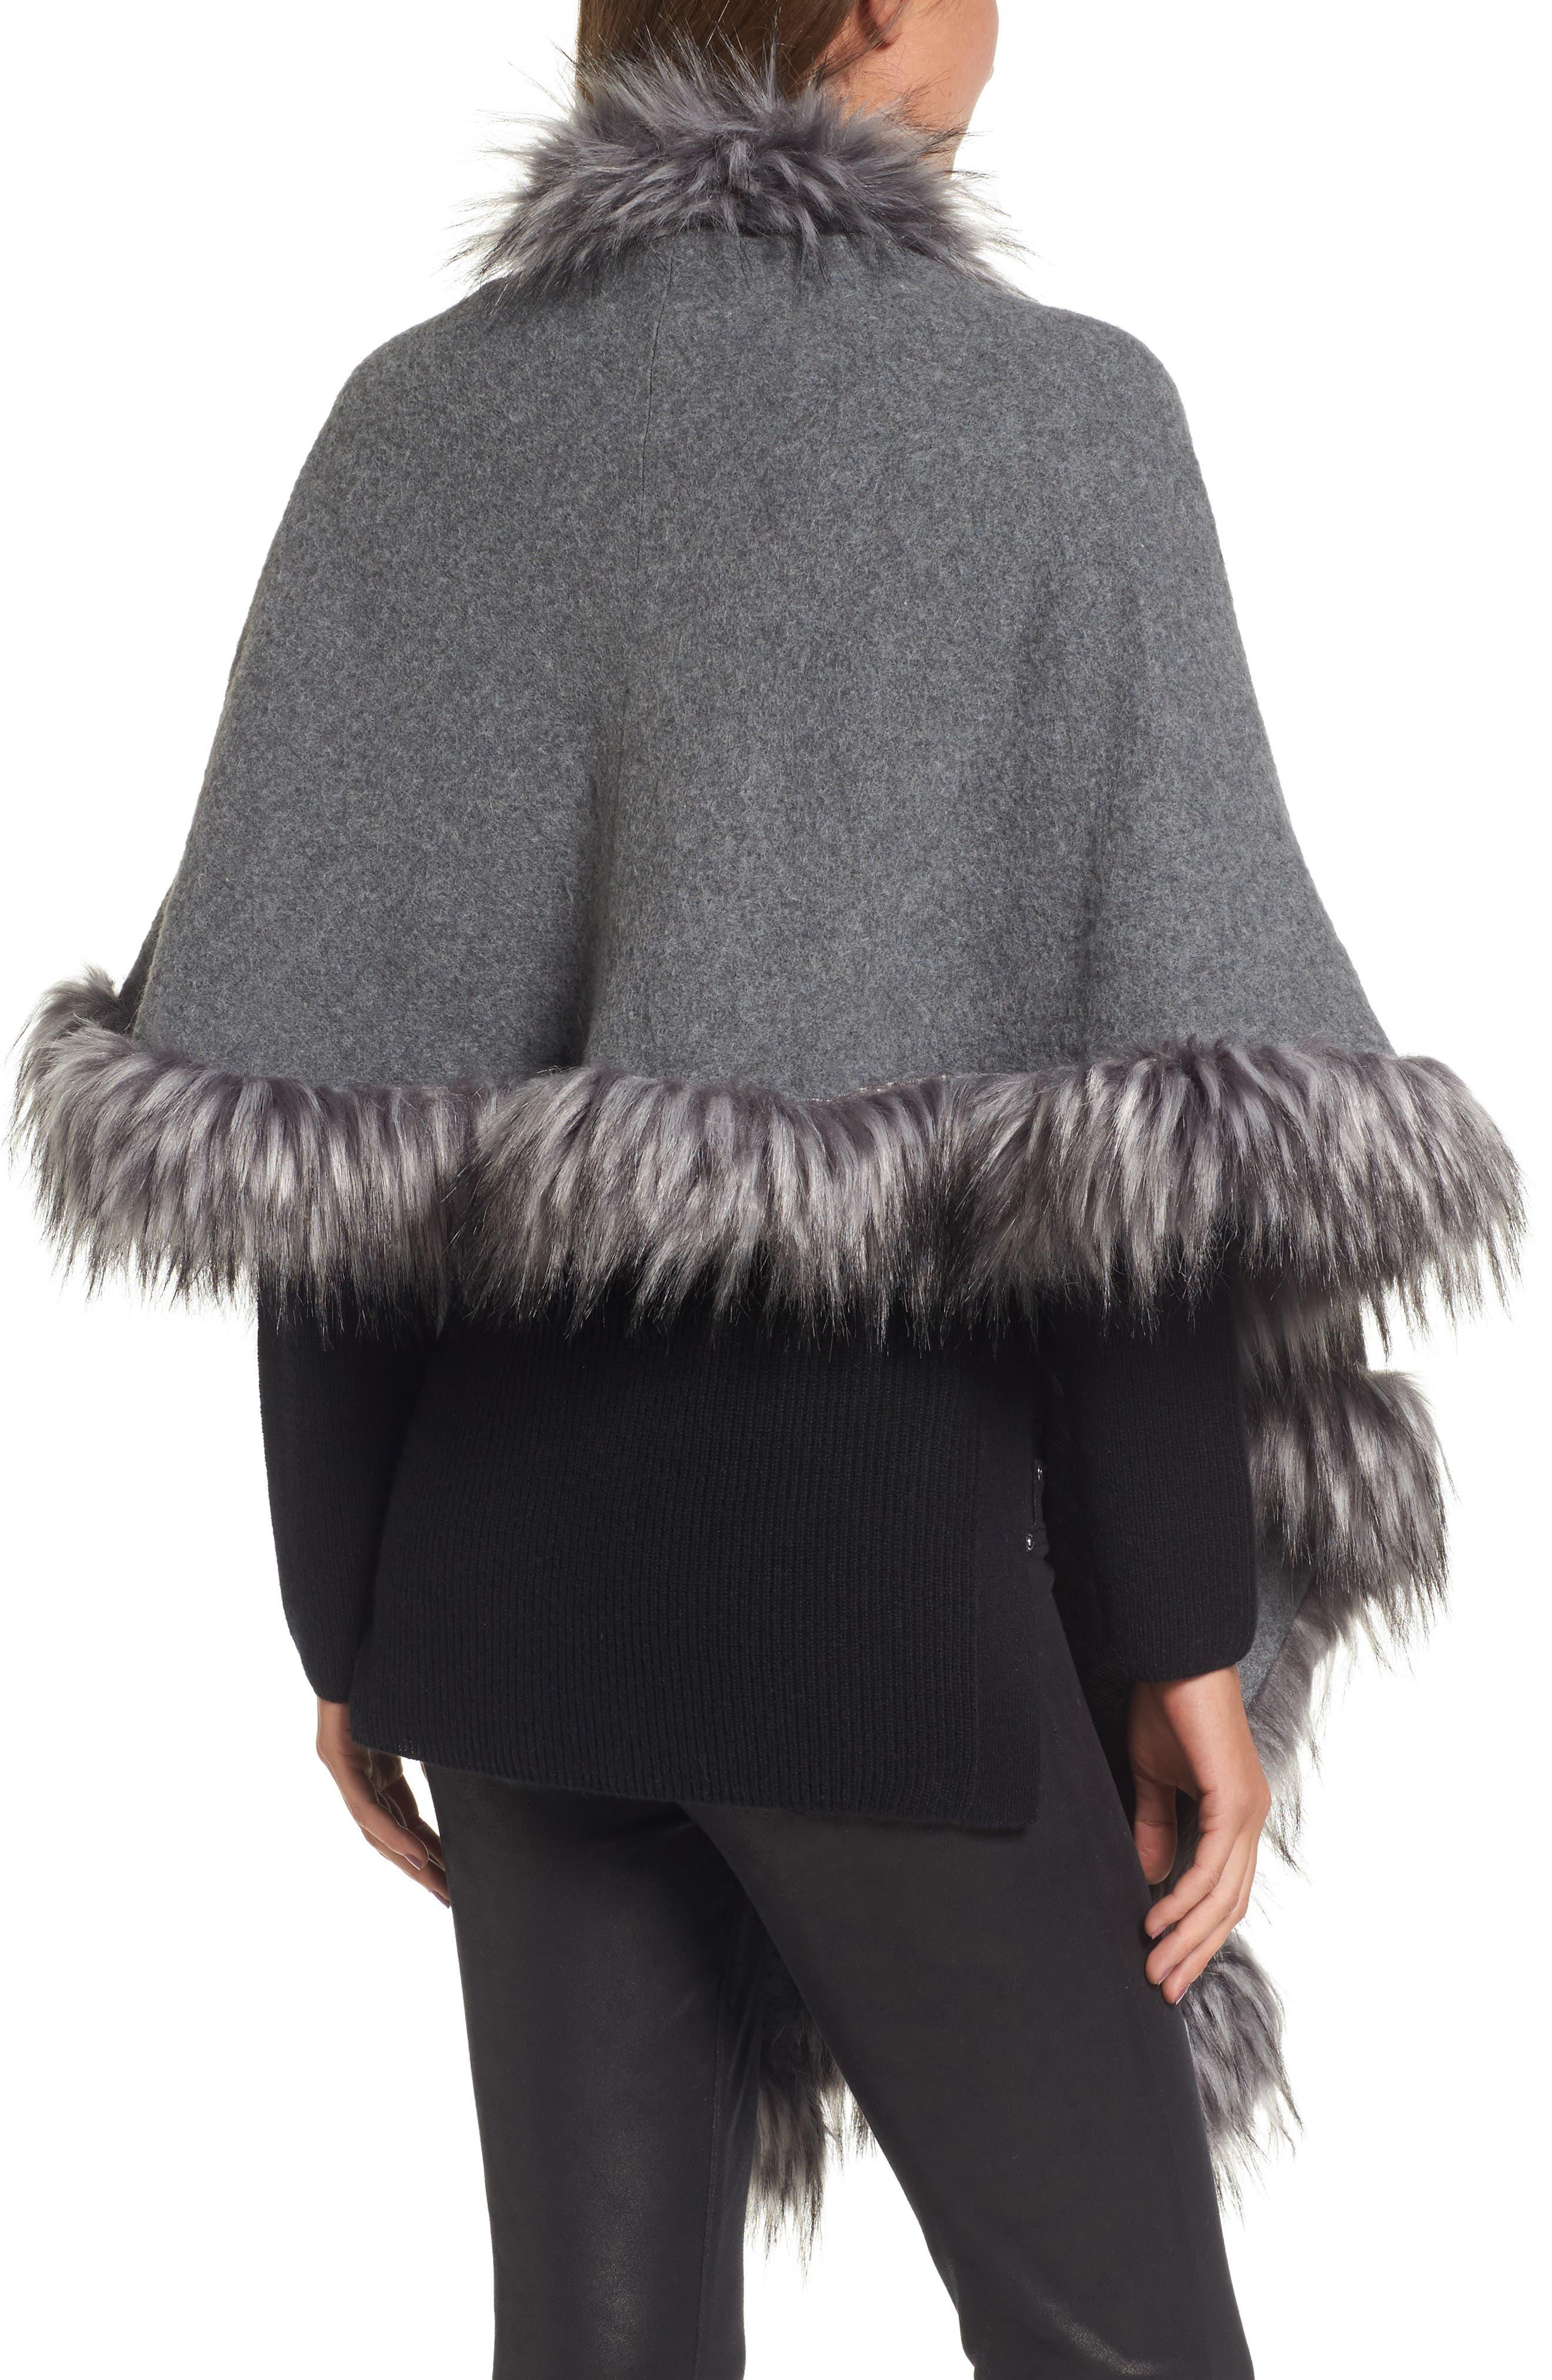 Knit Poncho with Faux Fur Trim,                             Alternate thumbnail 2, color,                             030